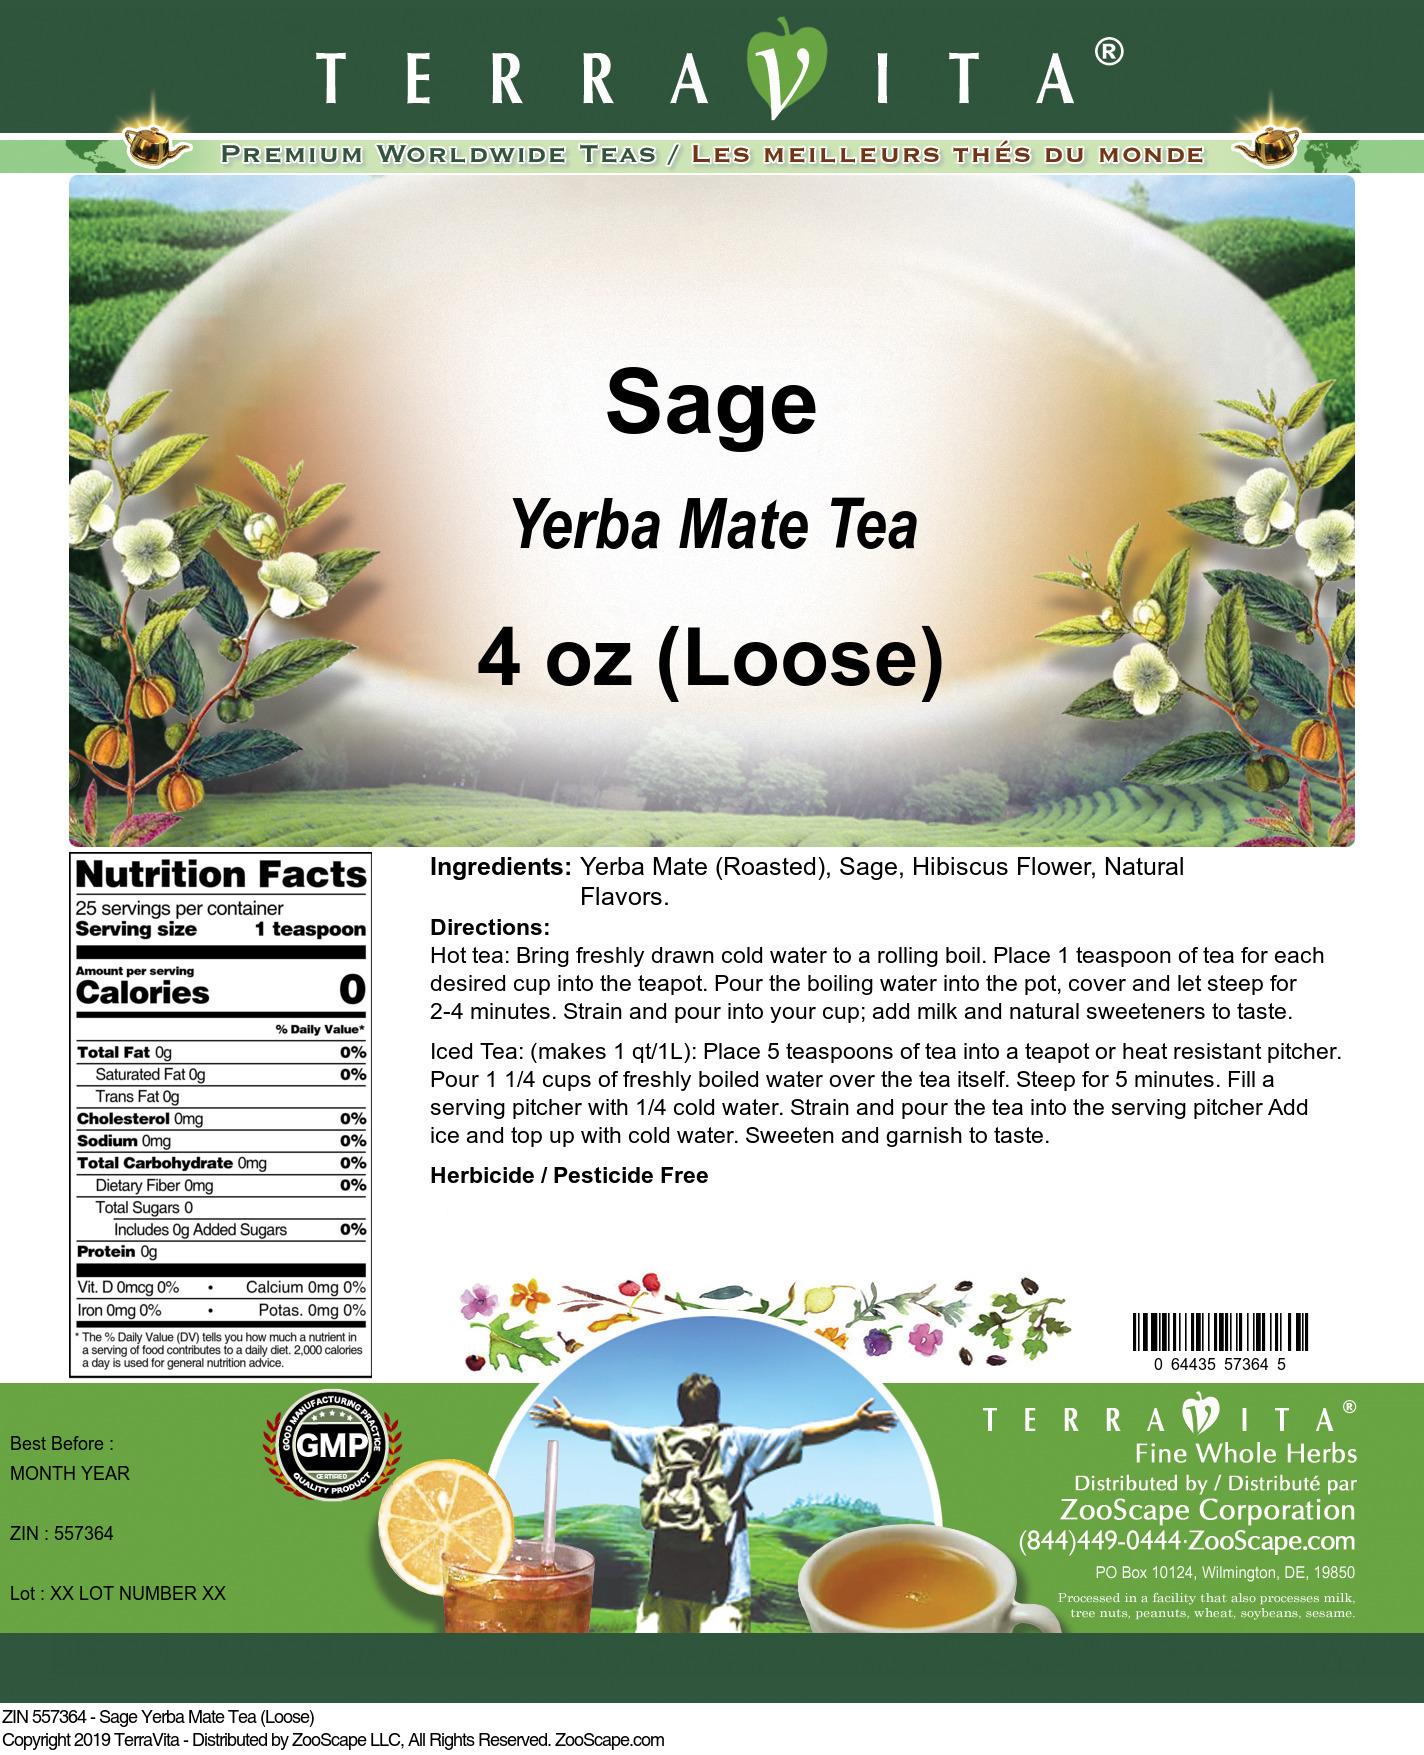 Sage Yerba Mate